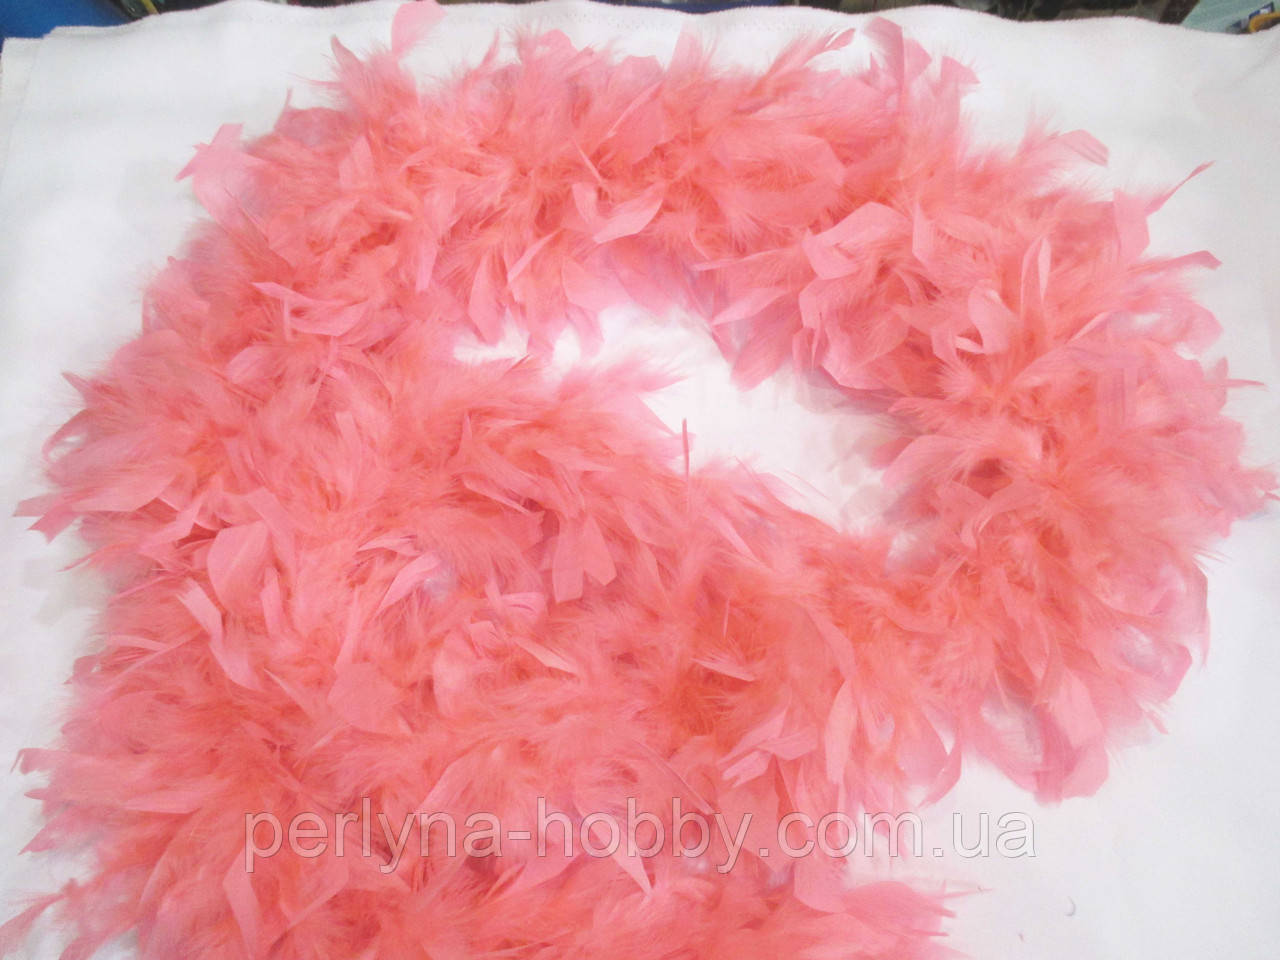 Боа 1,8 м 70 грамм рожевий (лосолевий)